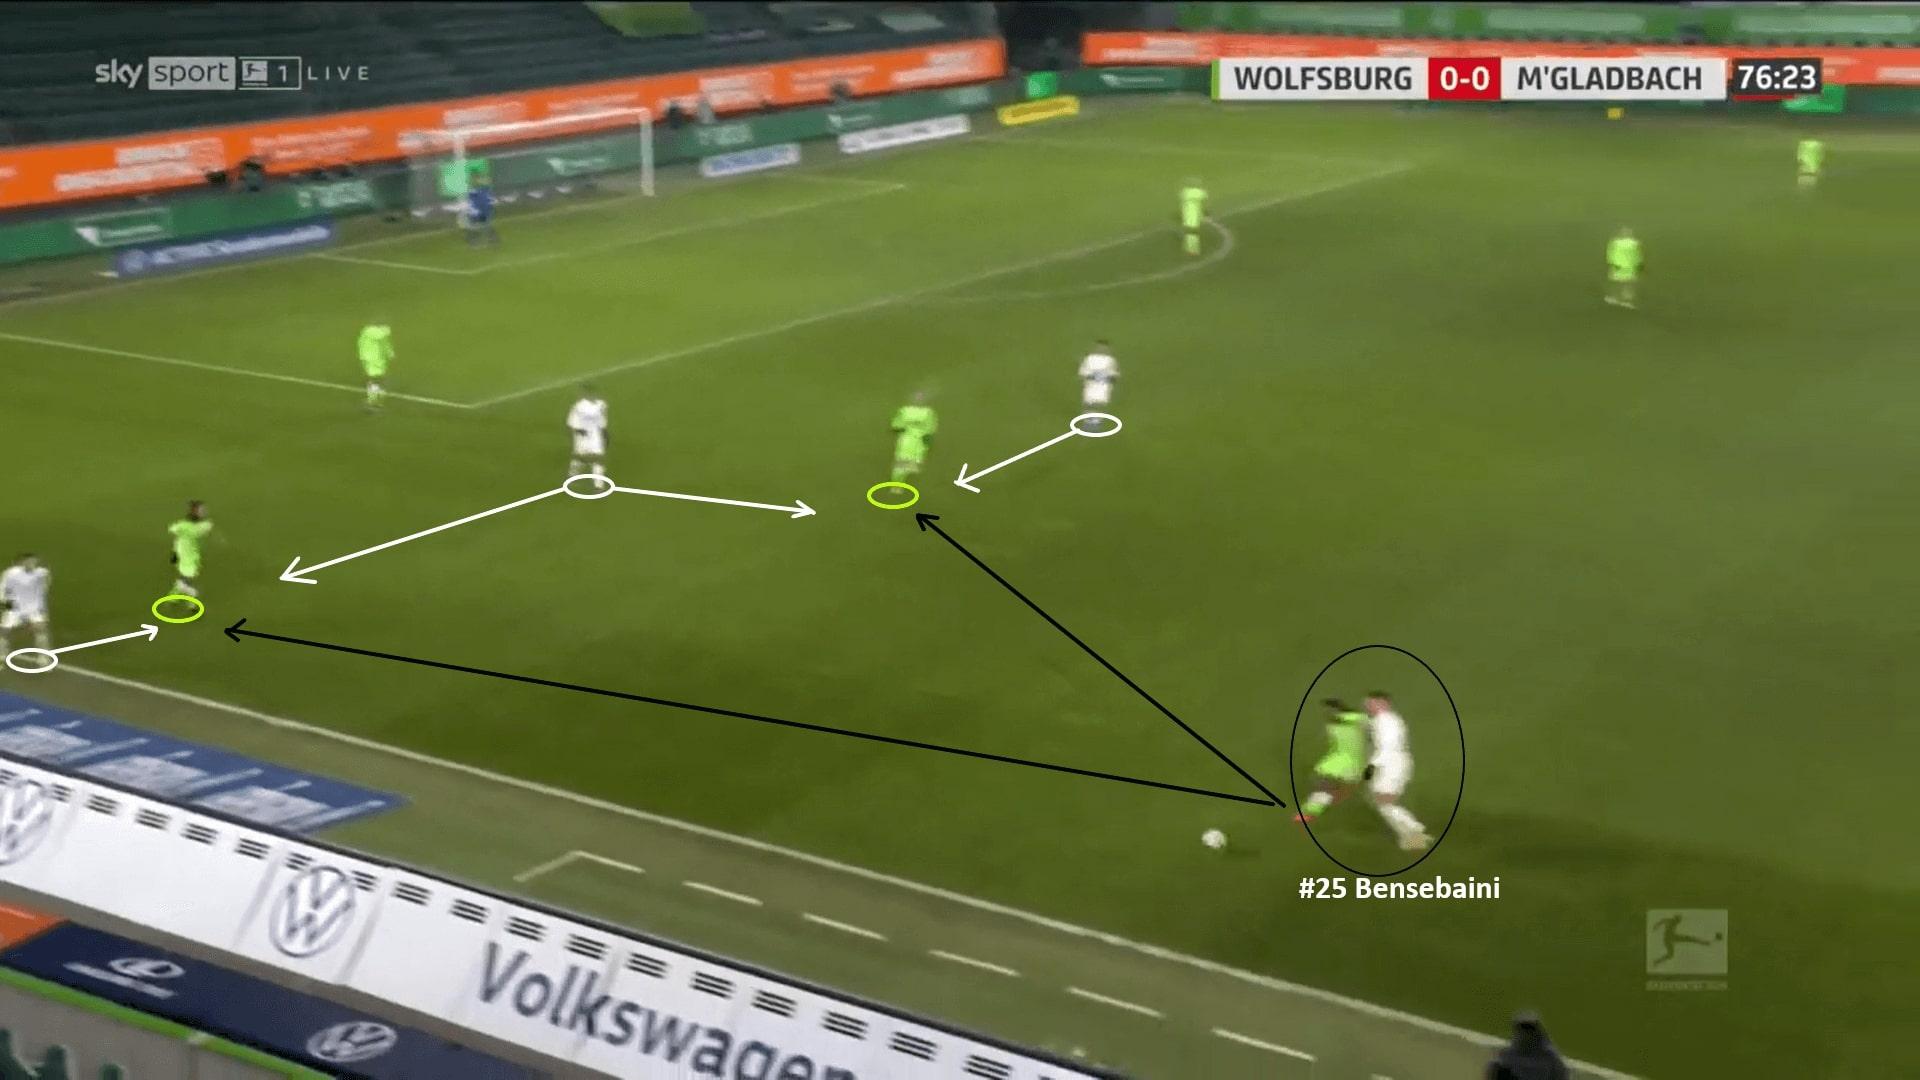 Marco Rose at Borussia Monchengladbach 2020/21 - tactical analysis - tactics